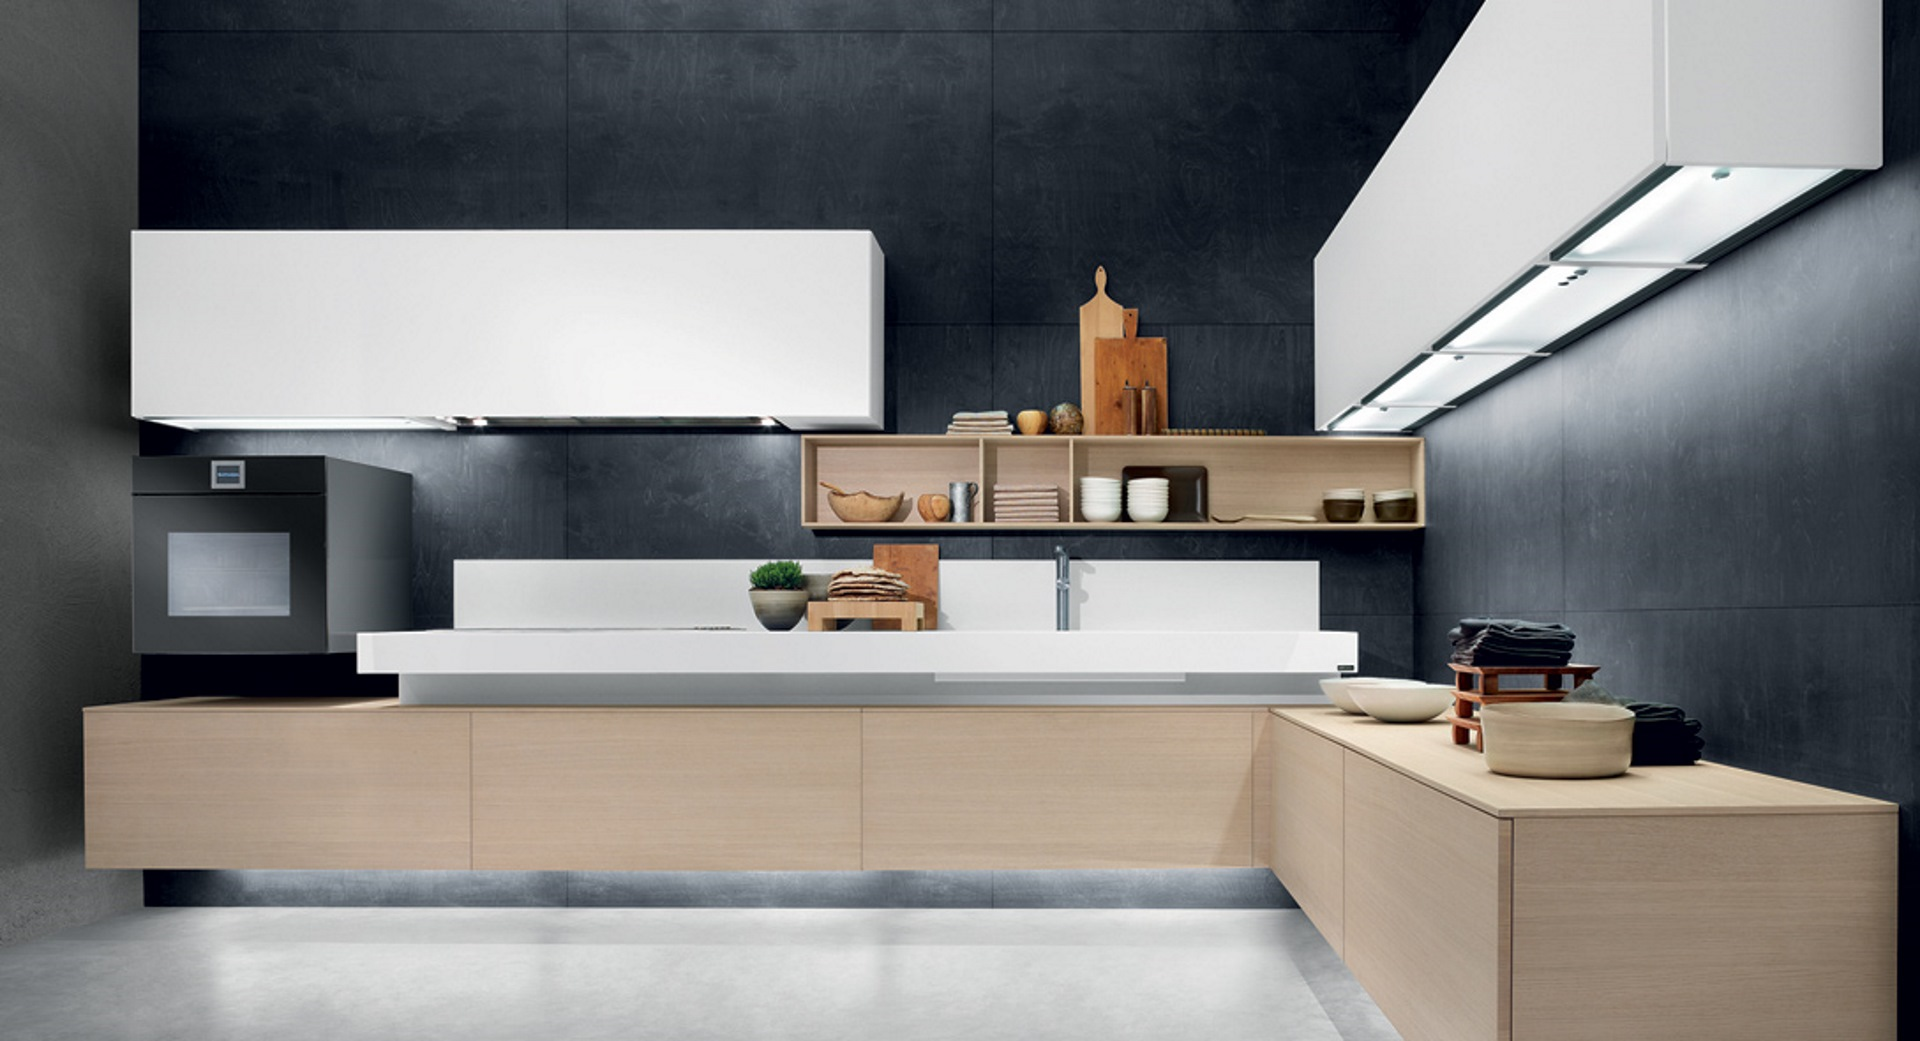 Free cucina moderna con basi ed elementi sospesi cucine composit - Cucina moderna design ...